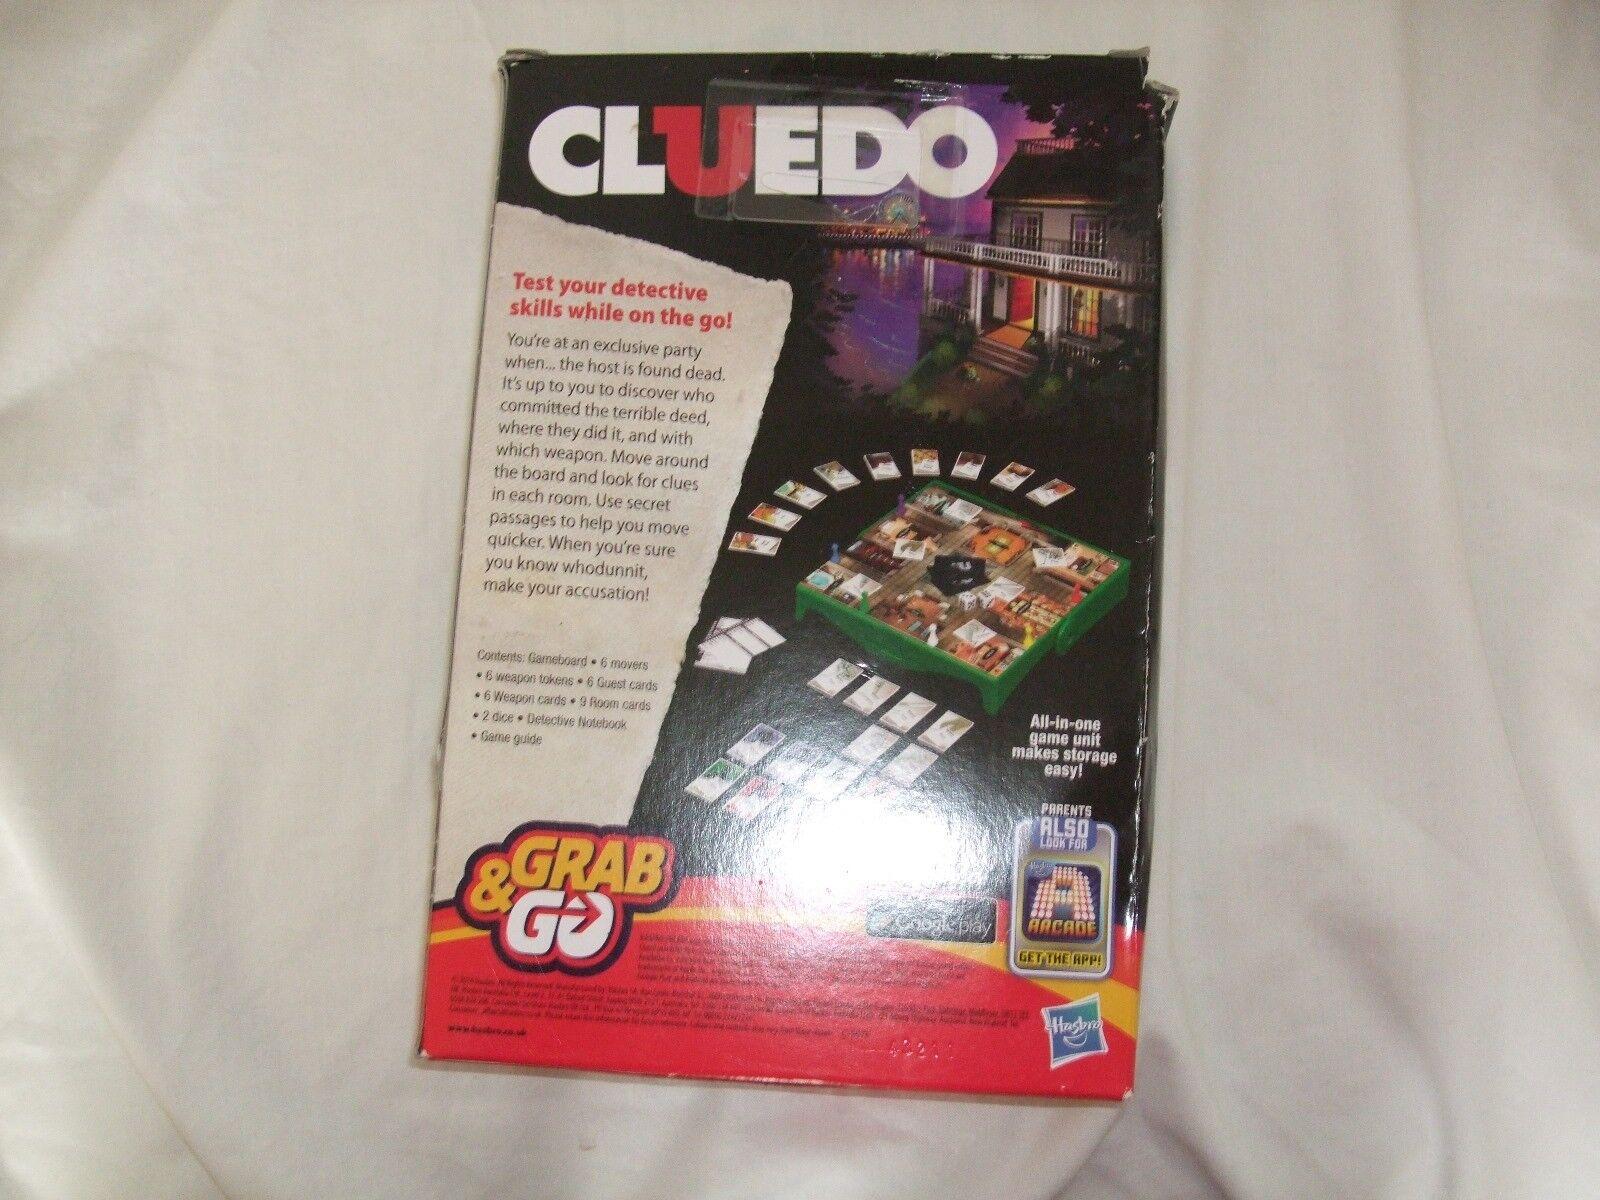 Grab & Go Travel Cluedo JUEGO. JUEGO. JUEGO. Hasbro GAMING v.g.c. f1ccd8